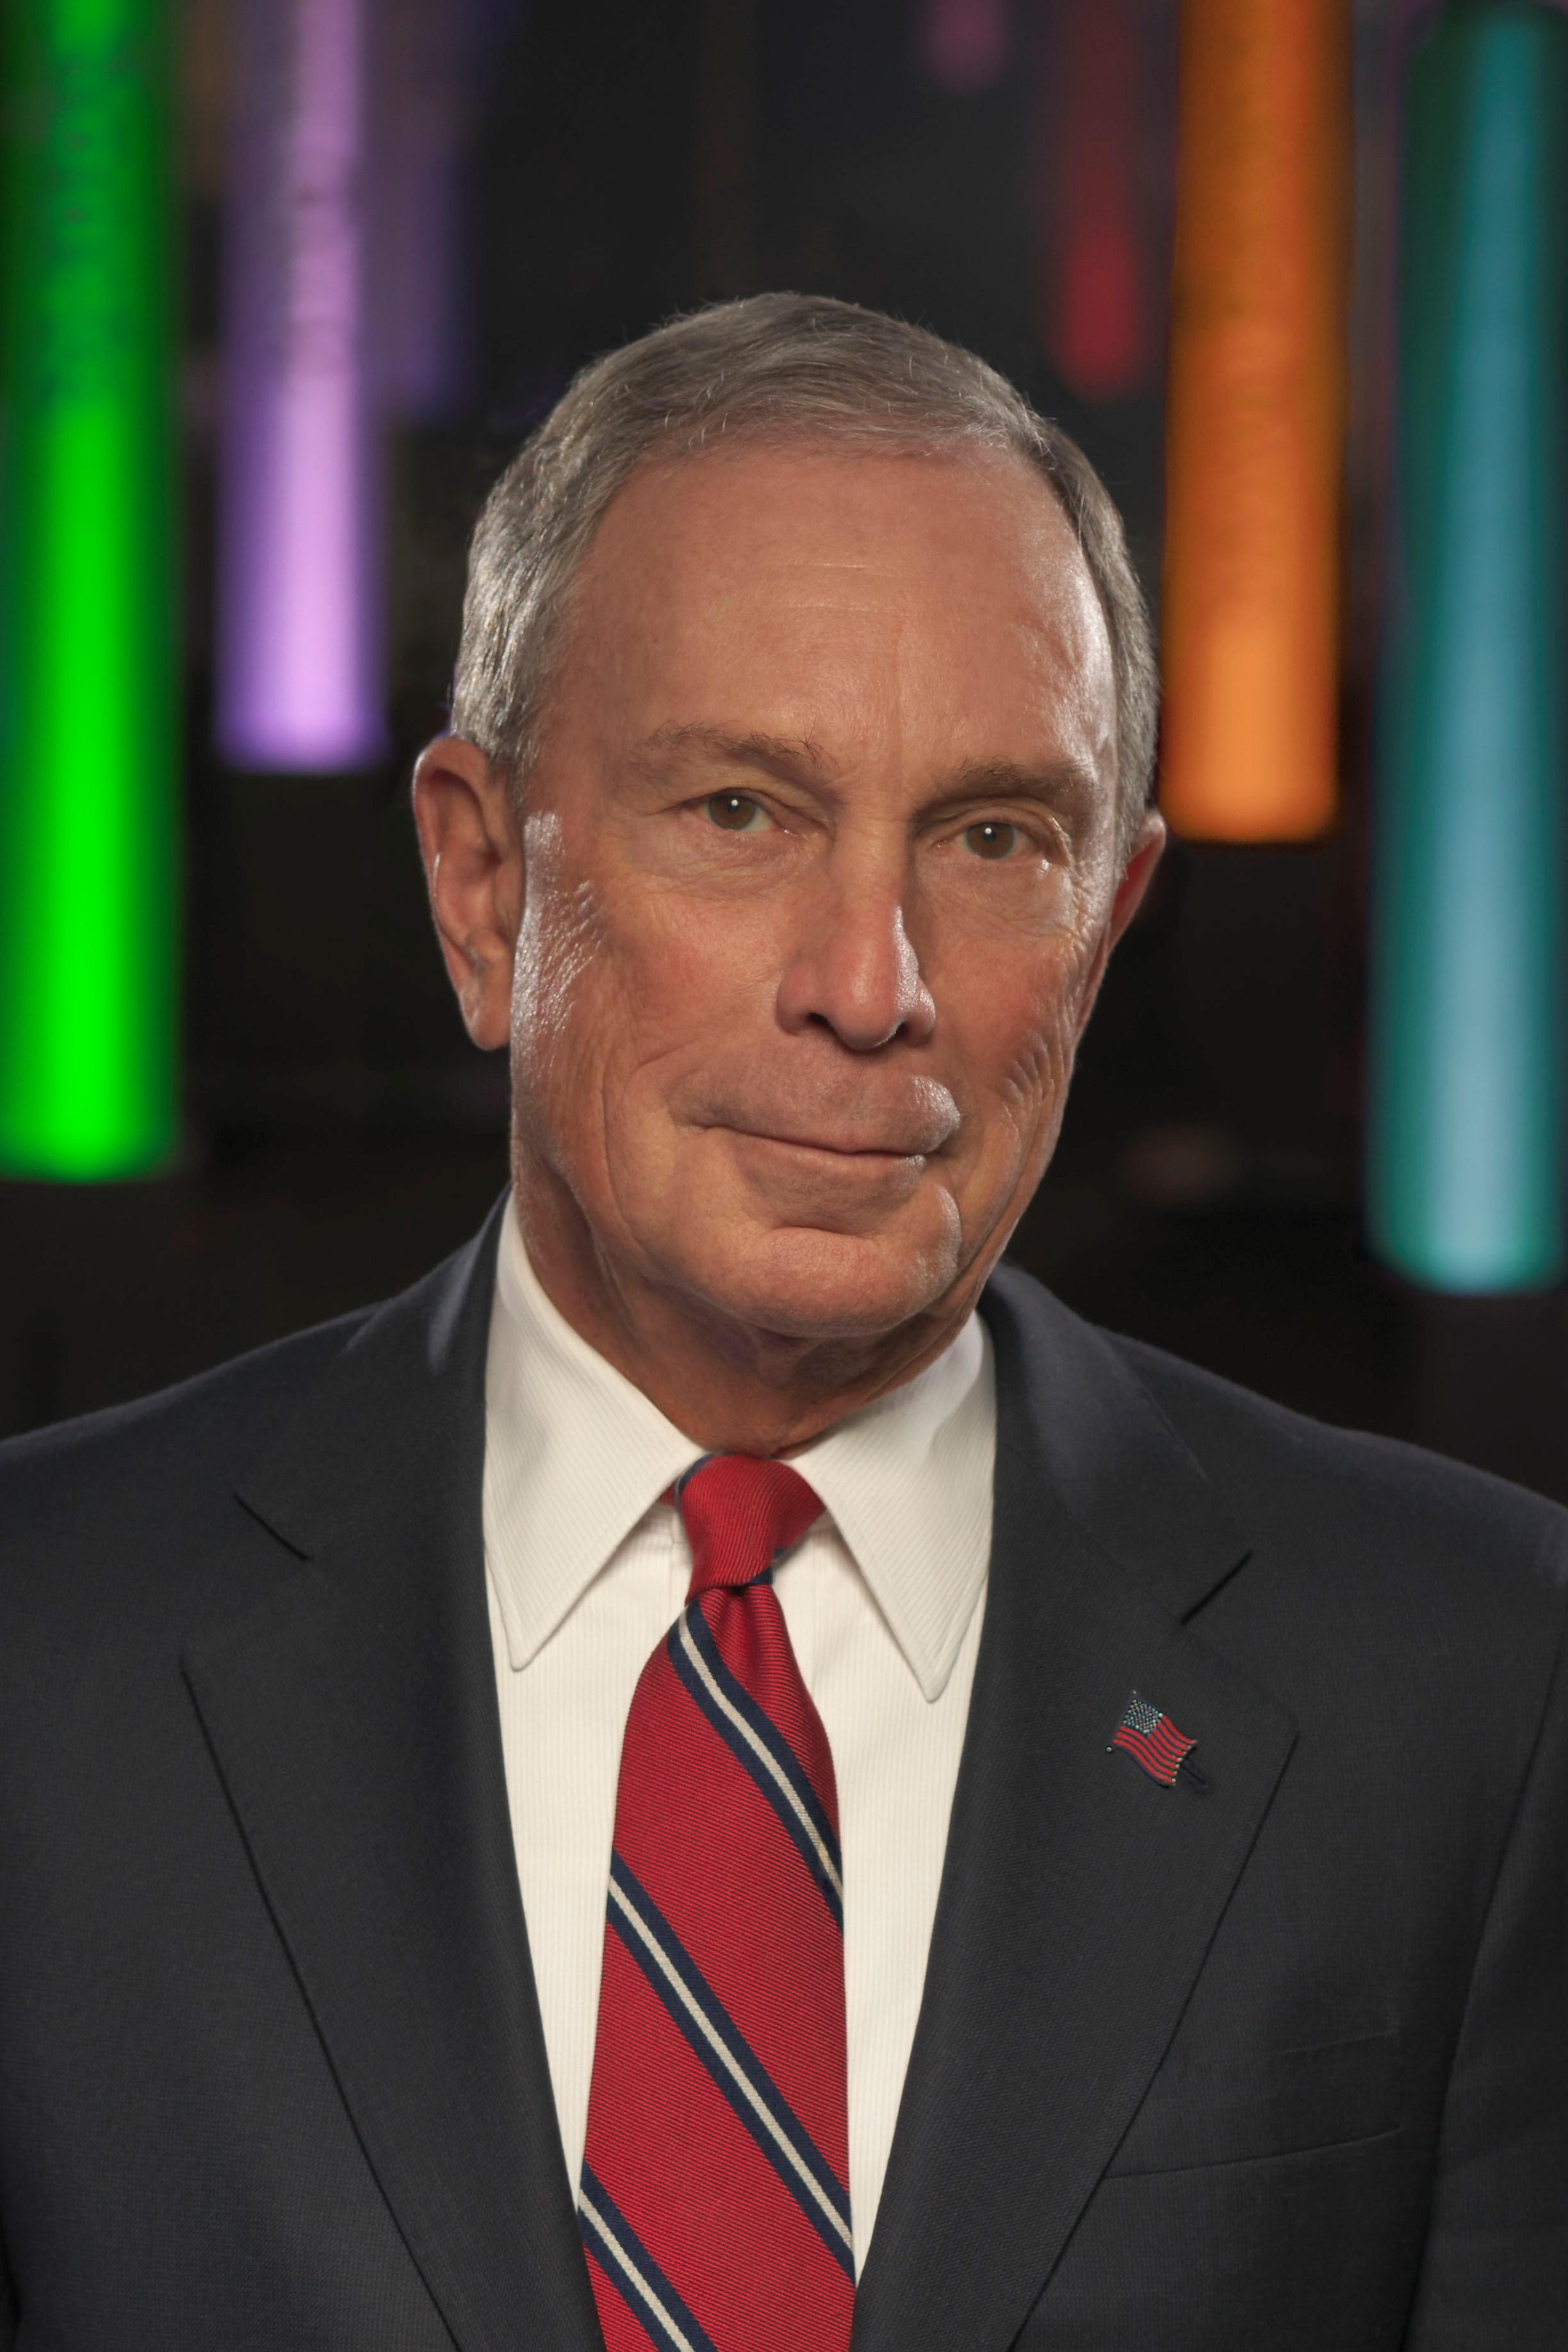 Photo of Michael R. Bloomberg